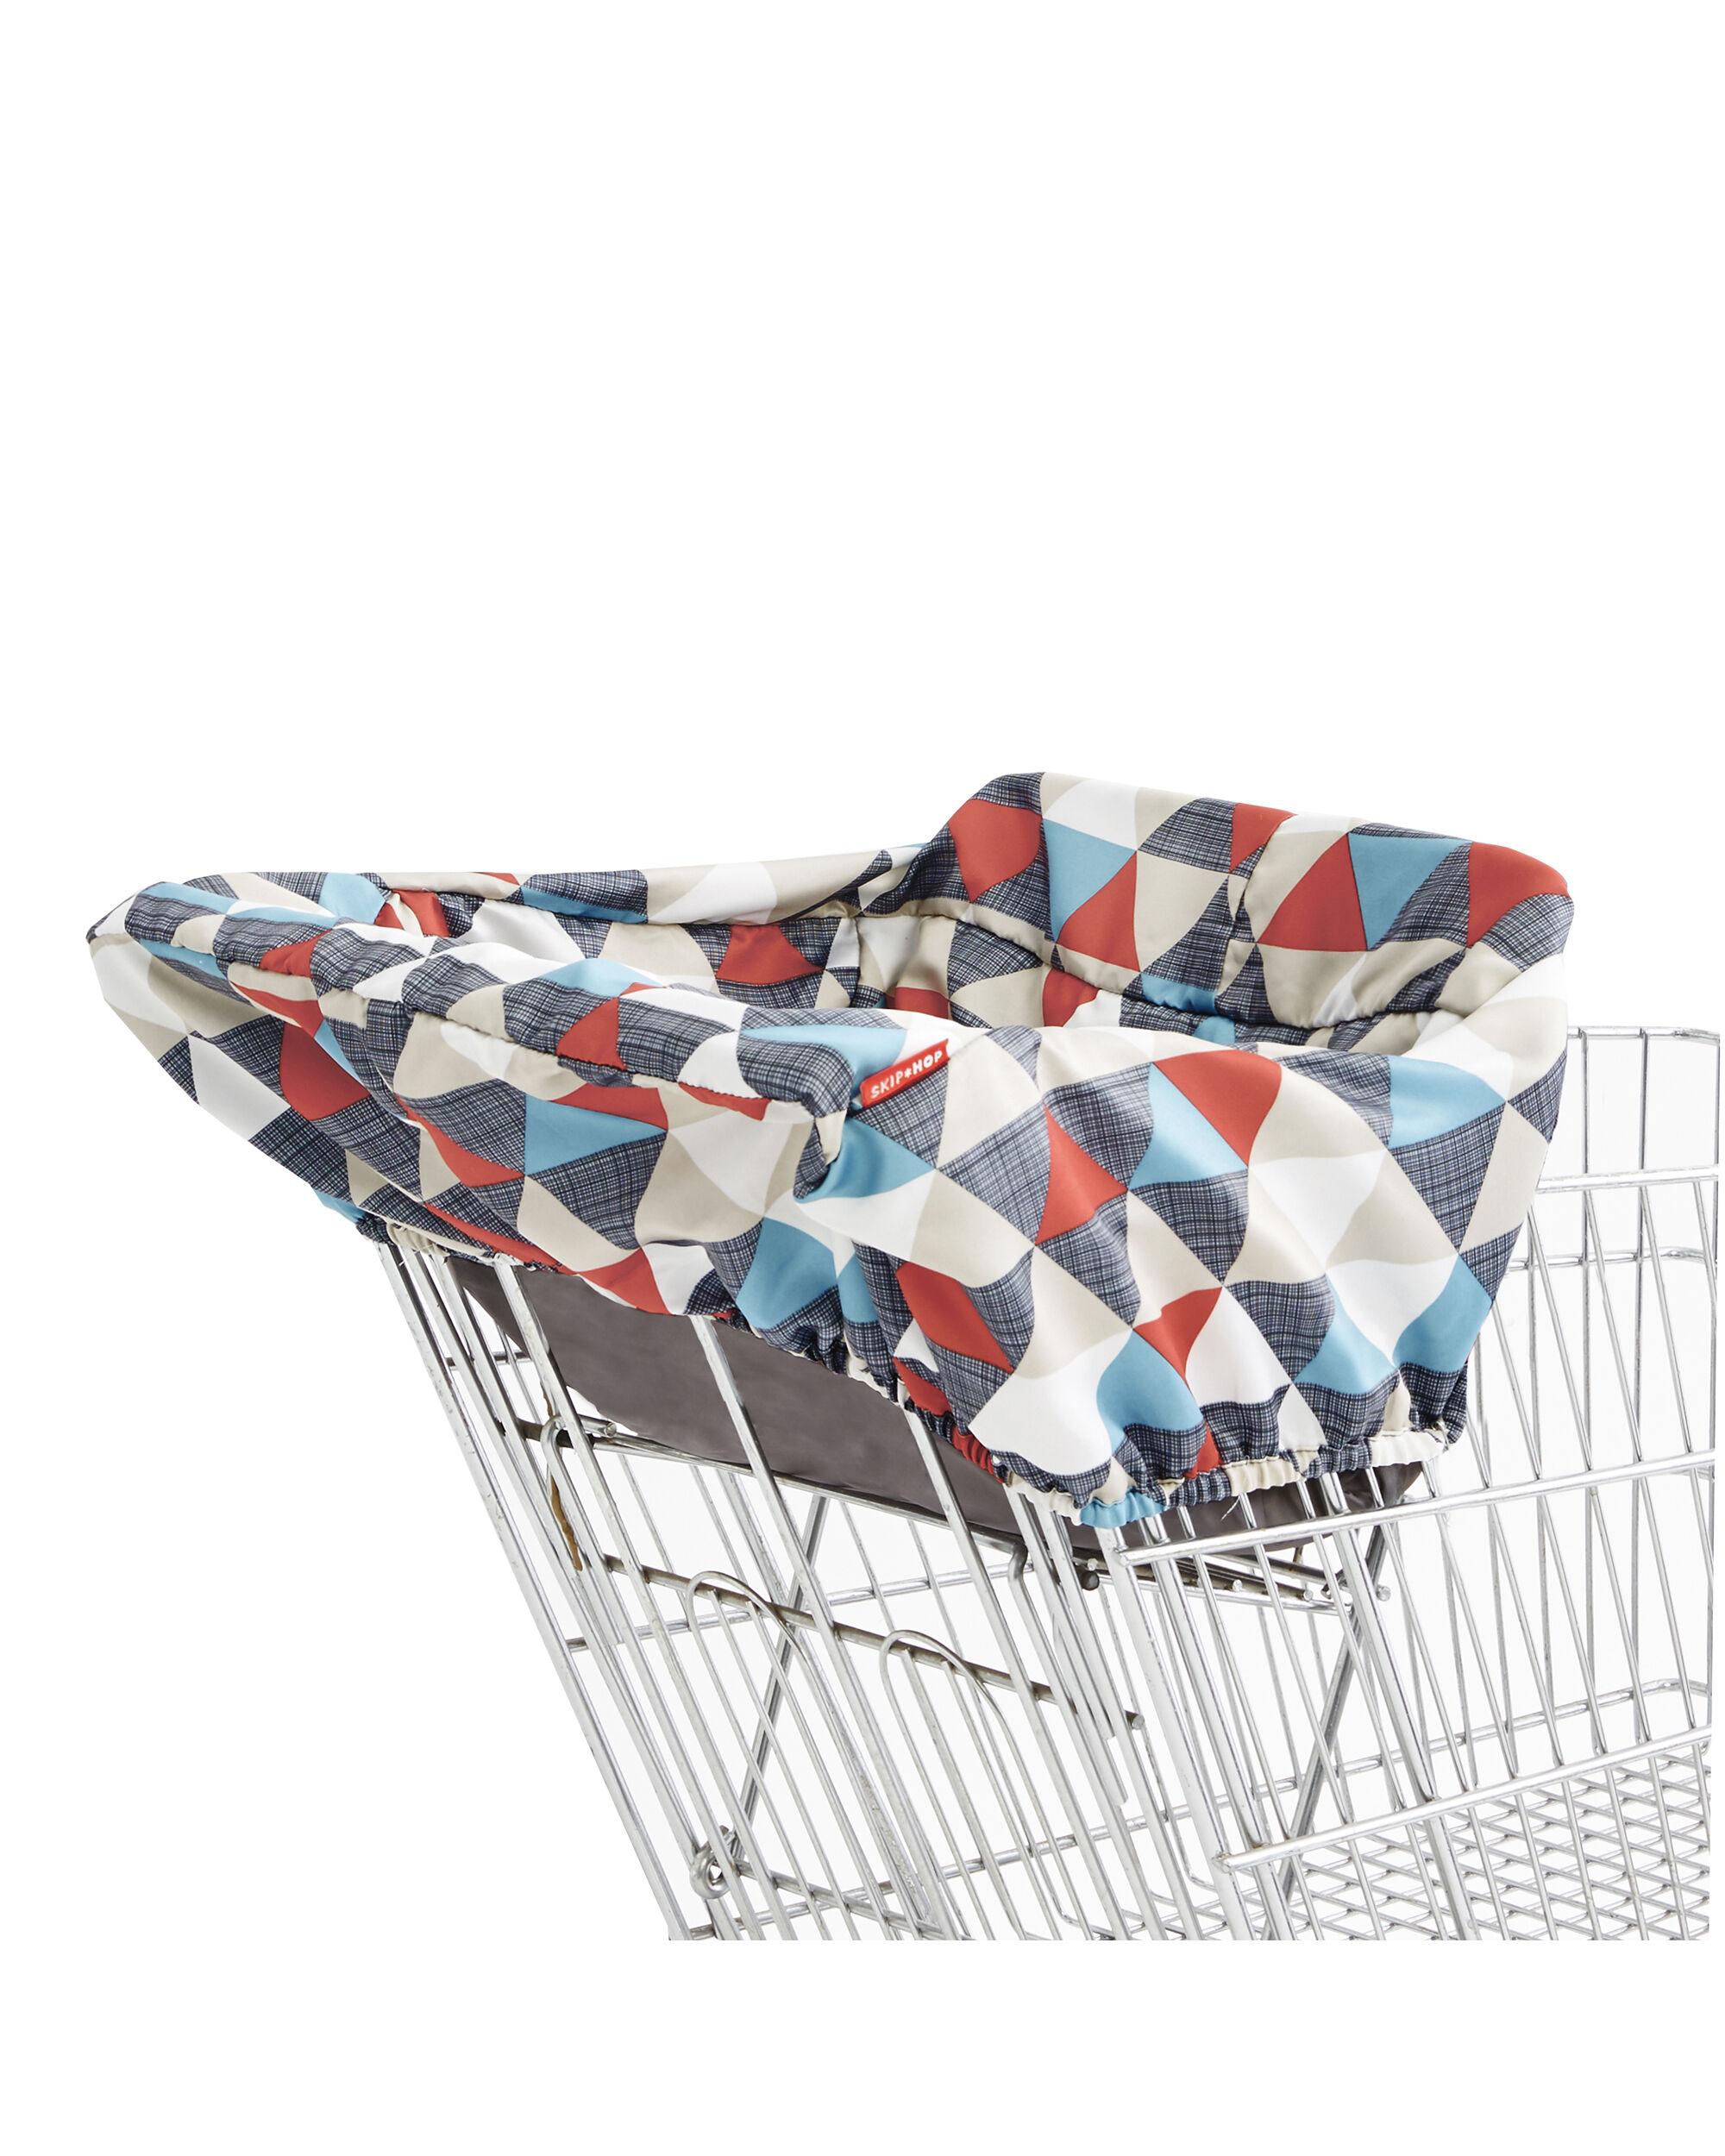 Take Cover Shopping Cart u0026 Baby High Chair Cover  sc 1 st  Skip Hop & Take Cover Shopping Cart u0026 Baby High Chair Cover | Skiphop.com